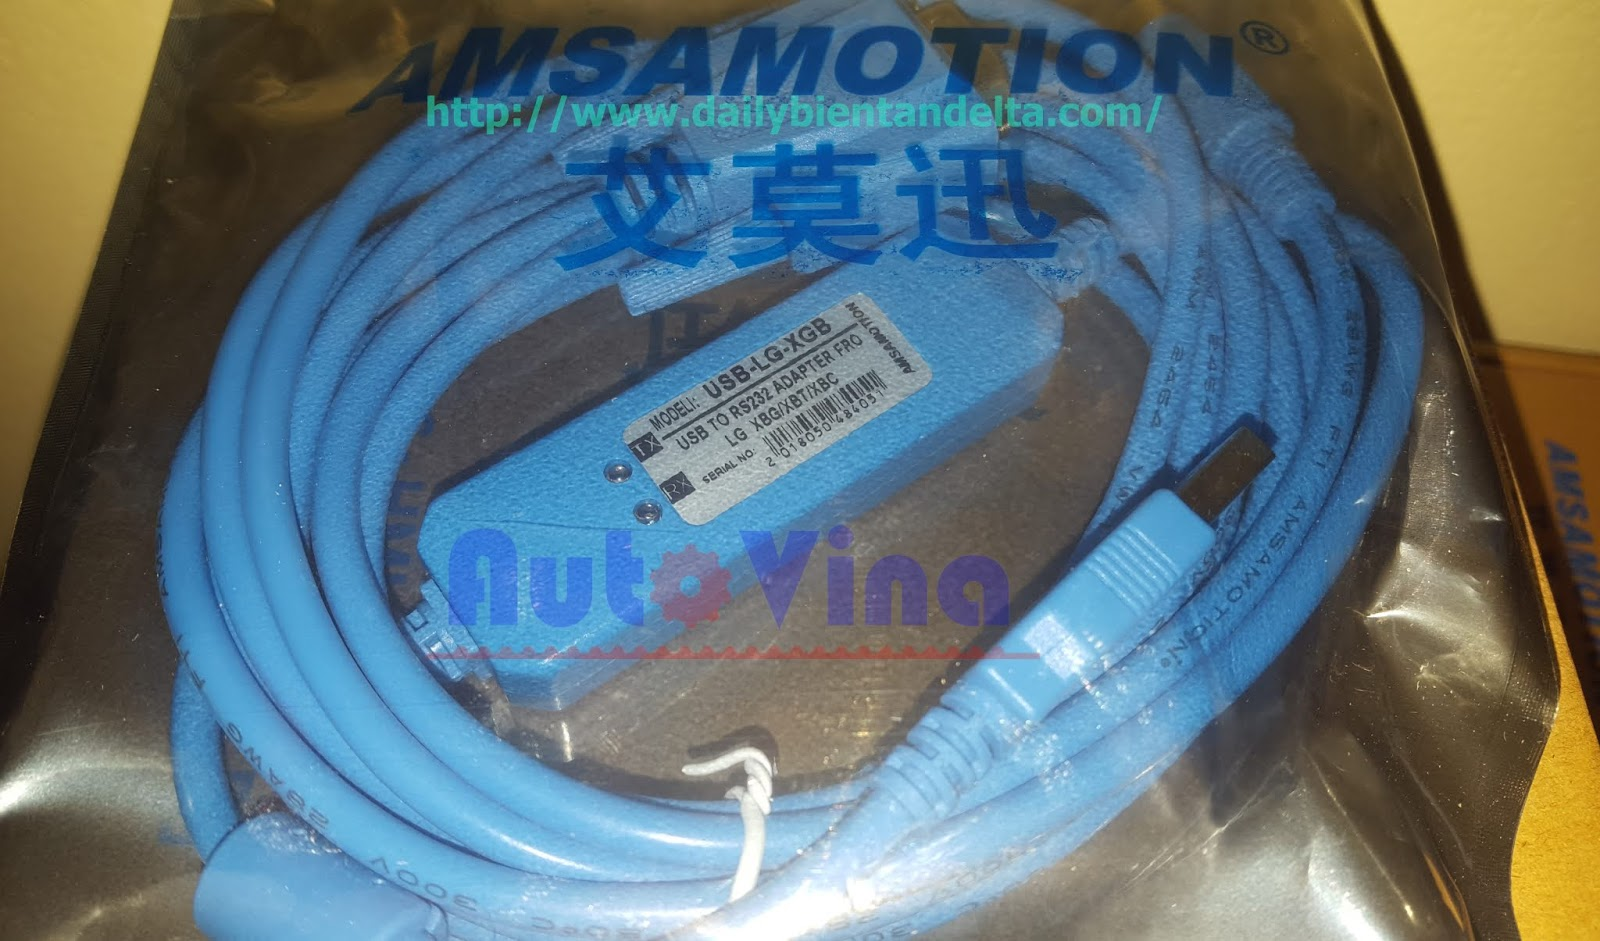 Cable kết nối lập trình PLC LG XGB XBC XBM Series USB-LG-XGB